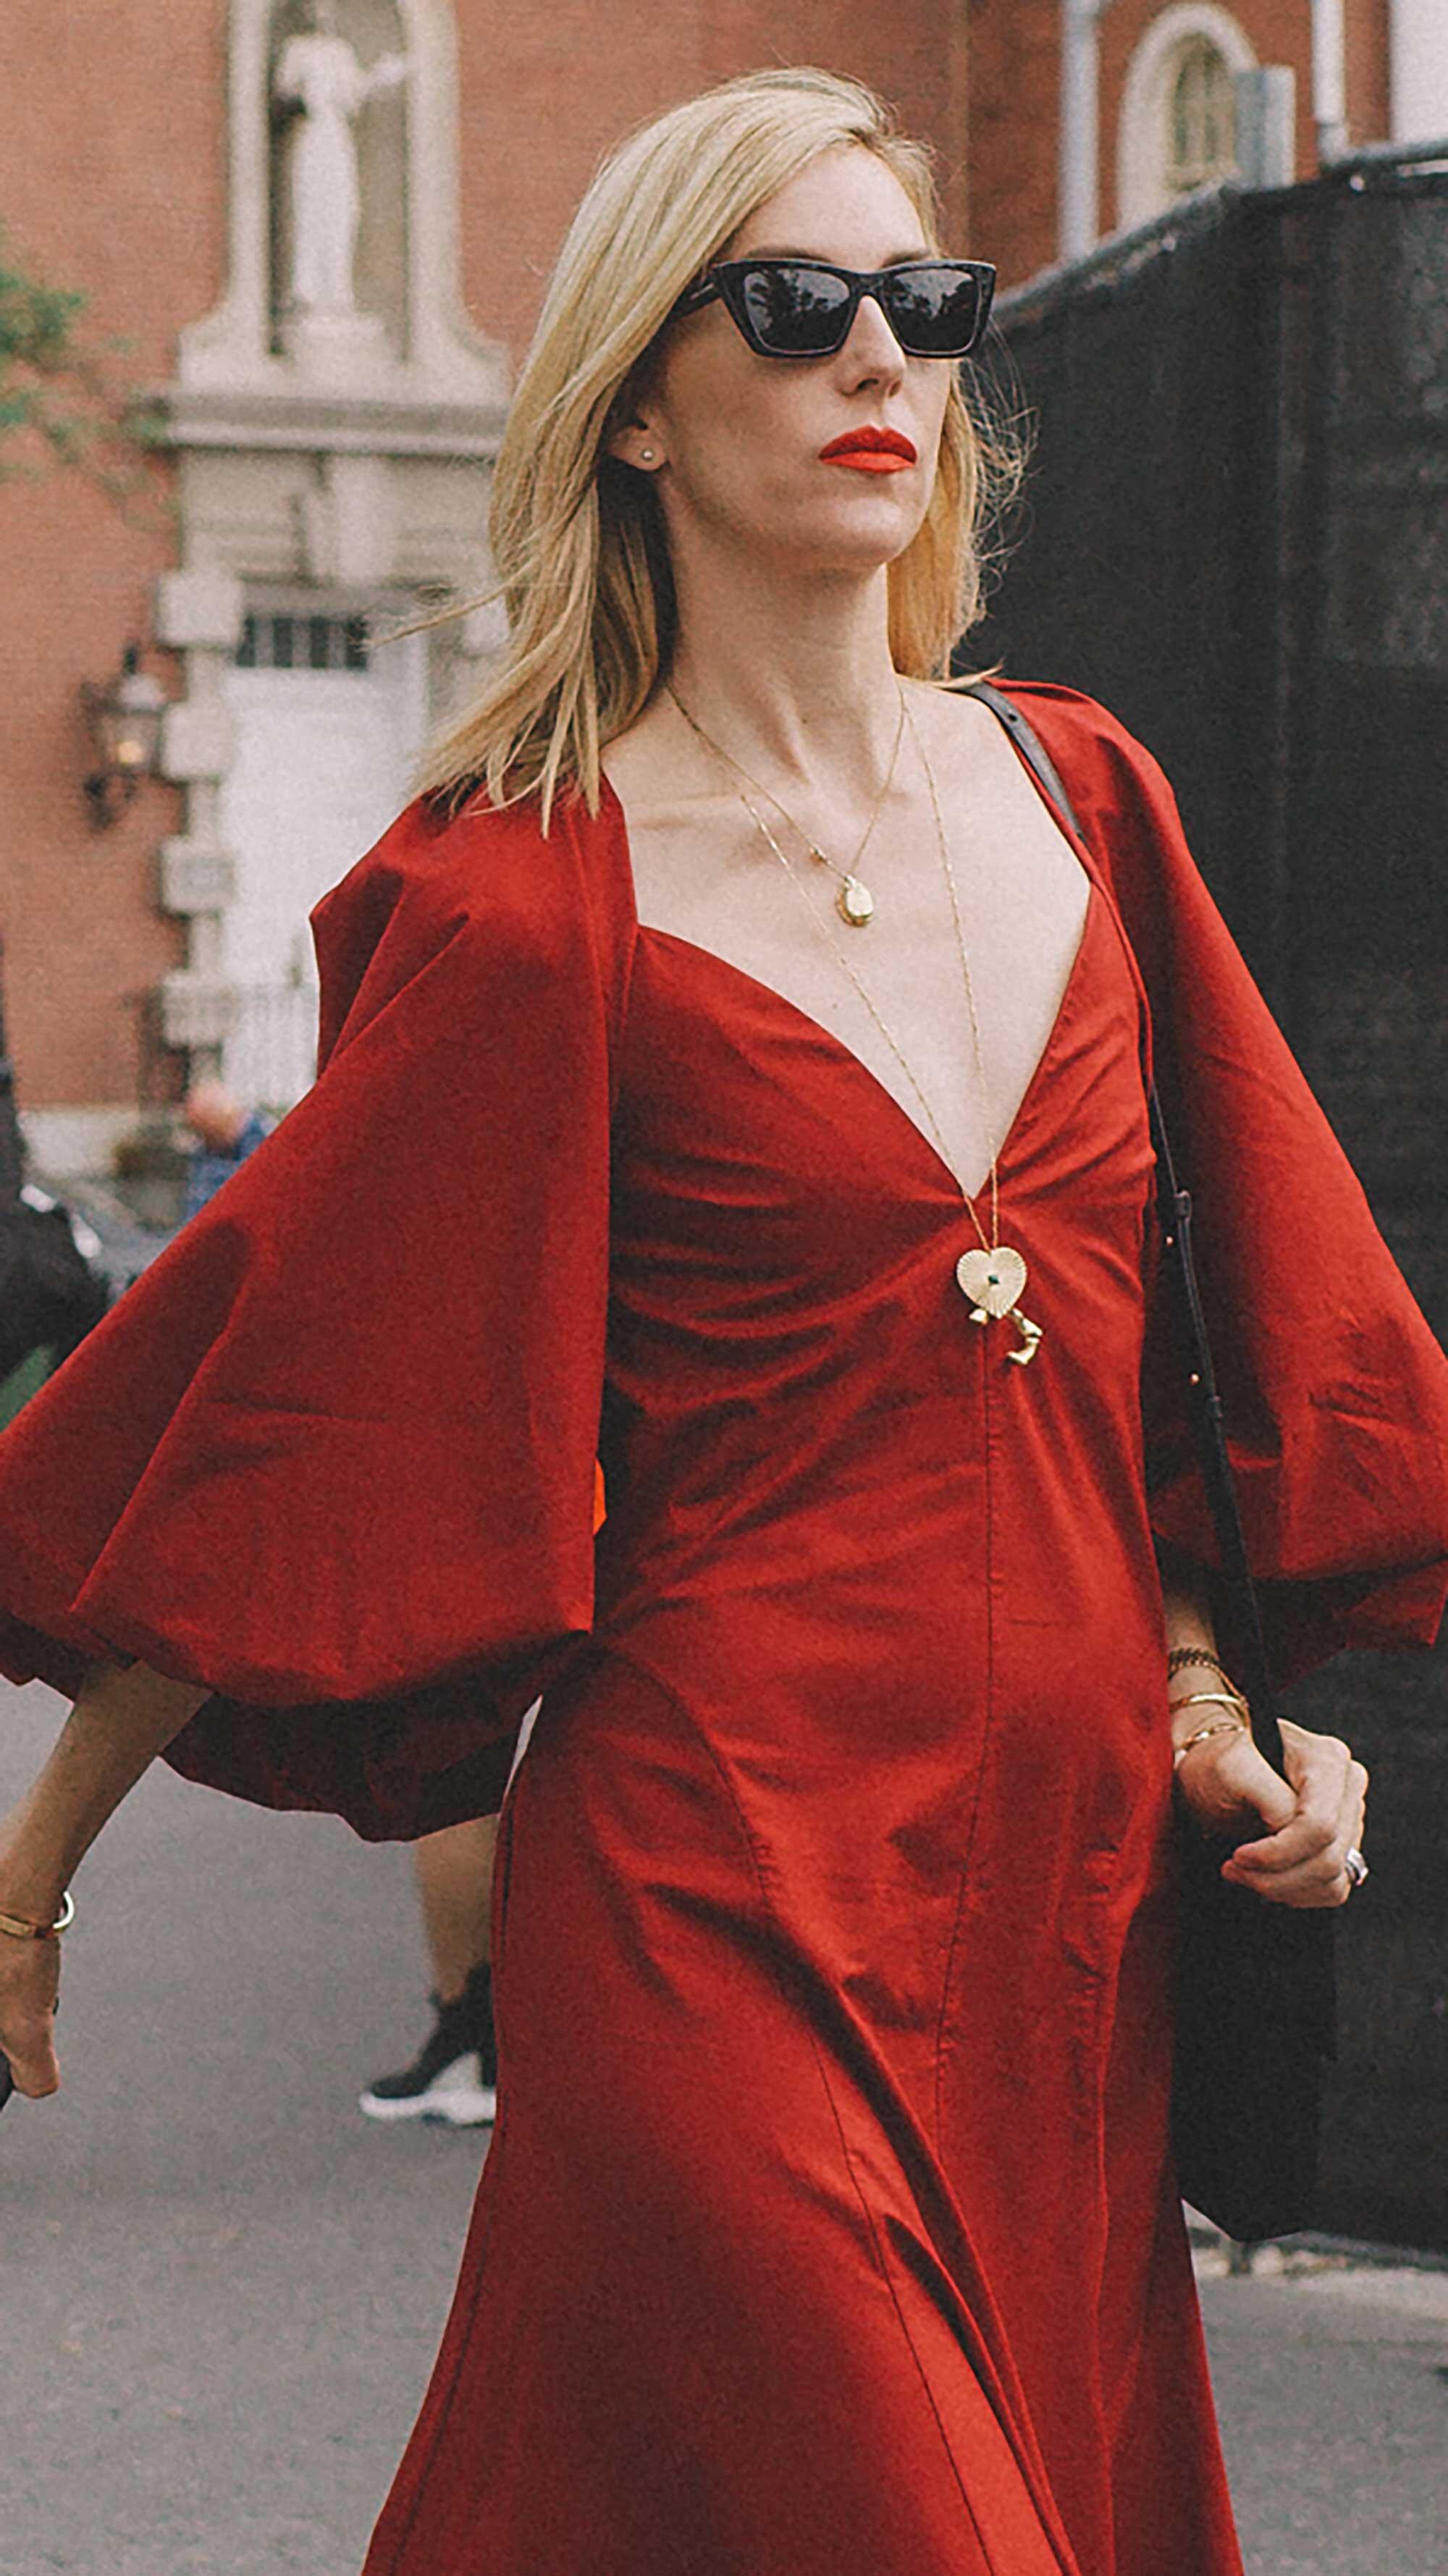 Click for more looks! Best outfits of New York Fashion Week street style 2019 Day Three Photo by @J2martinez Jose J. Martinez www.jmrtnz.com -1.jpg